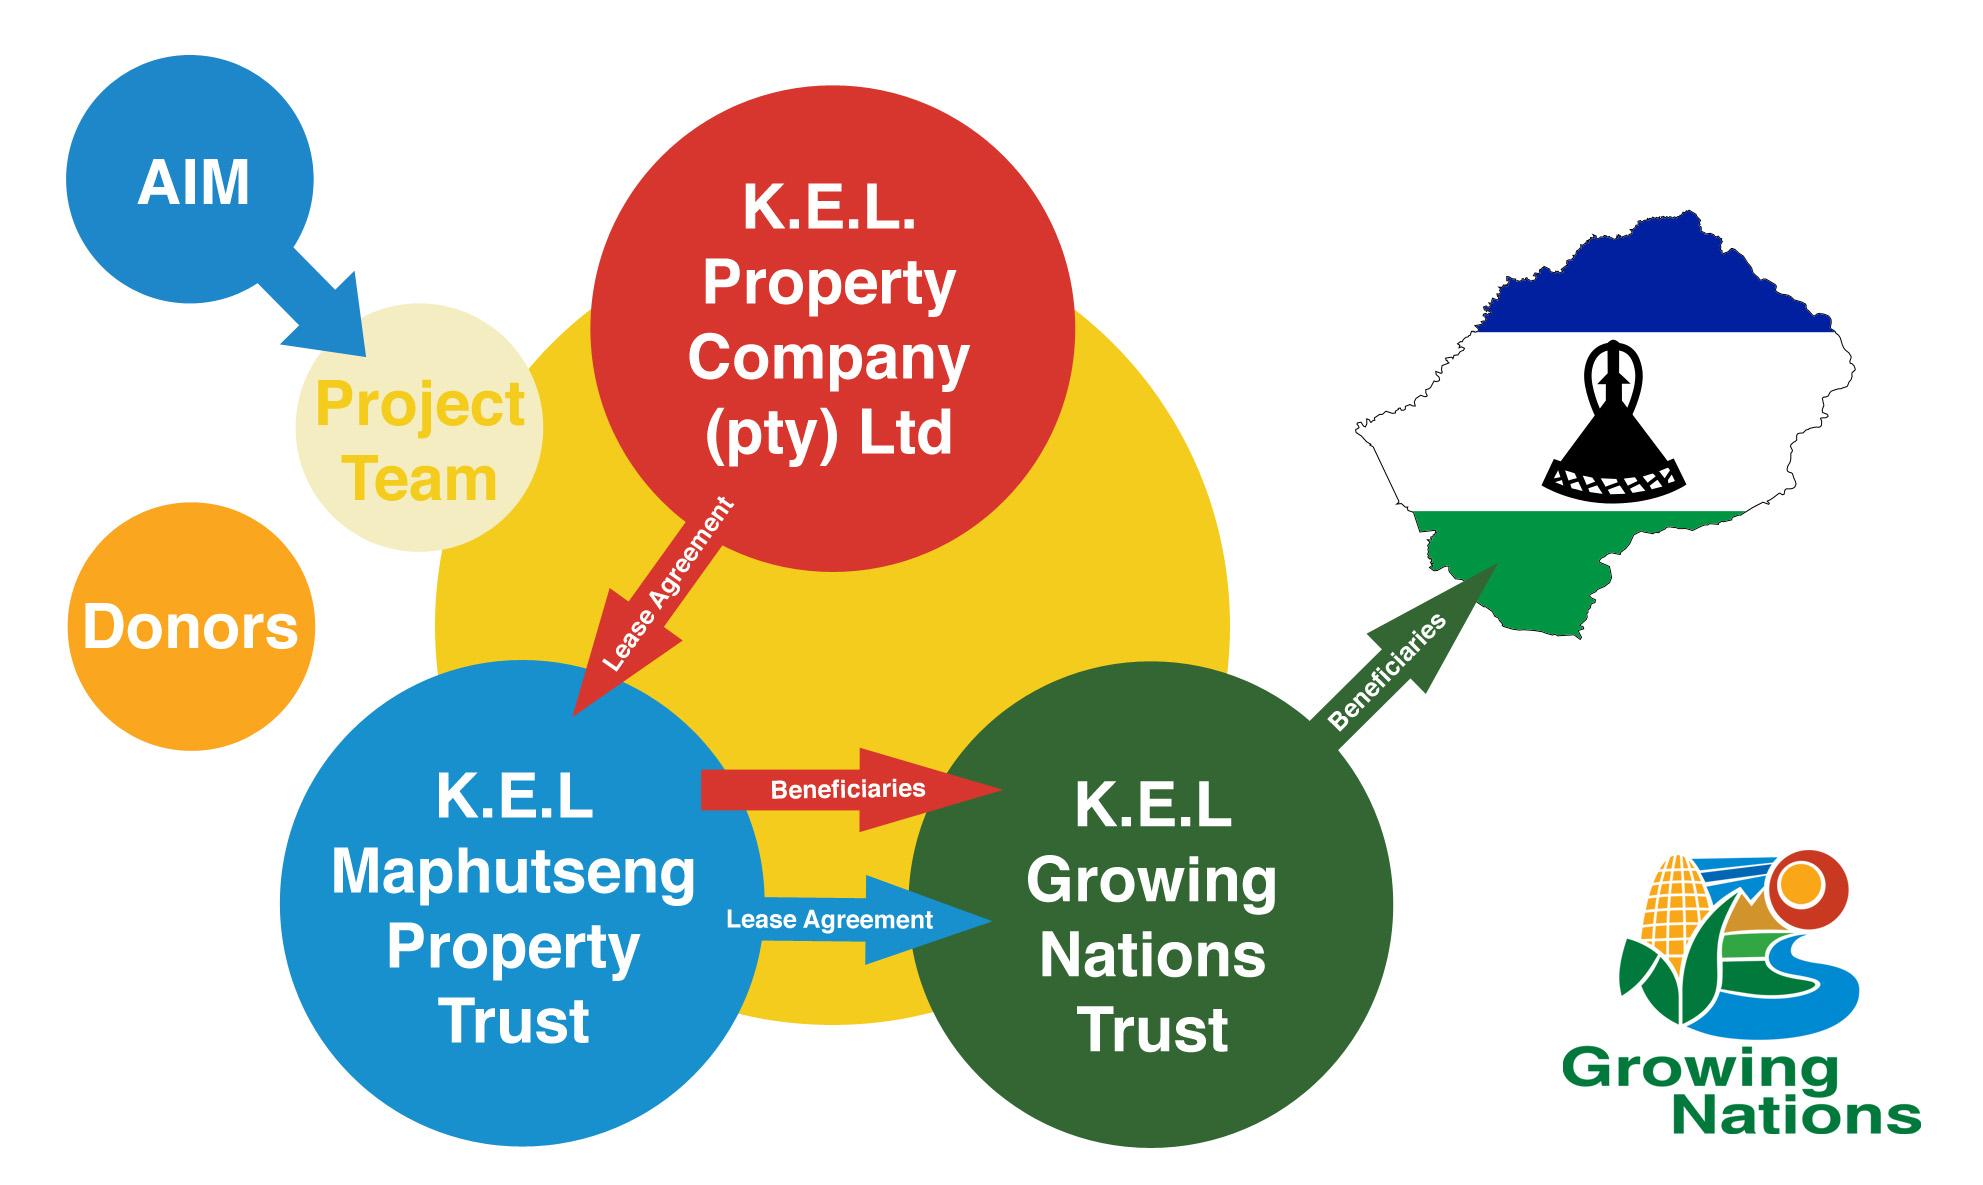 Maphutseng Property Structure